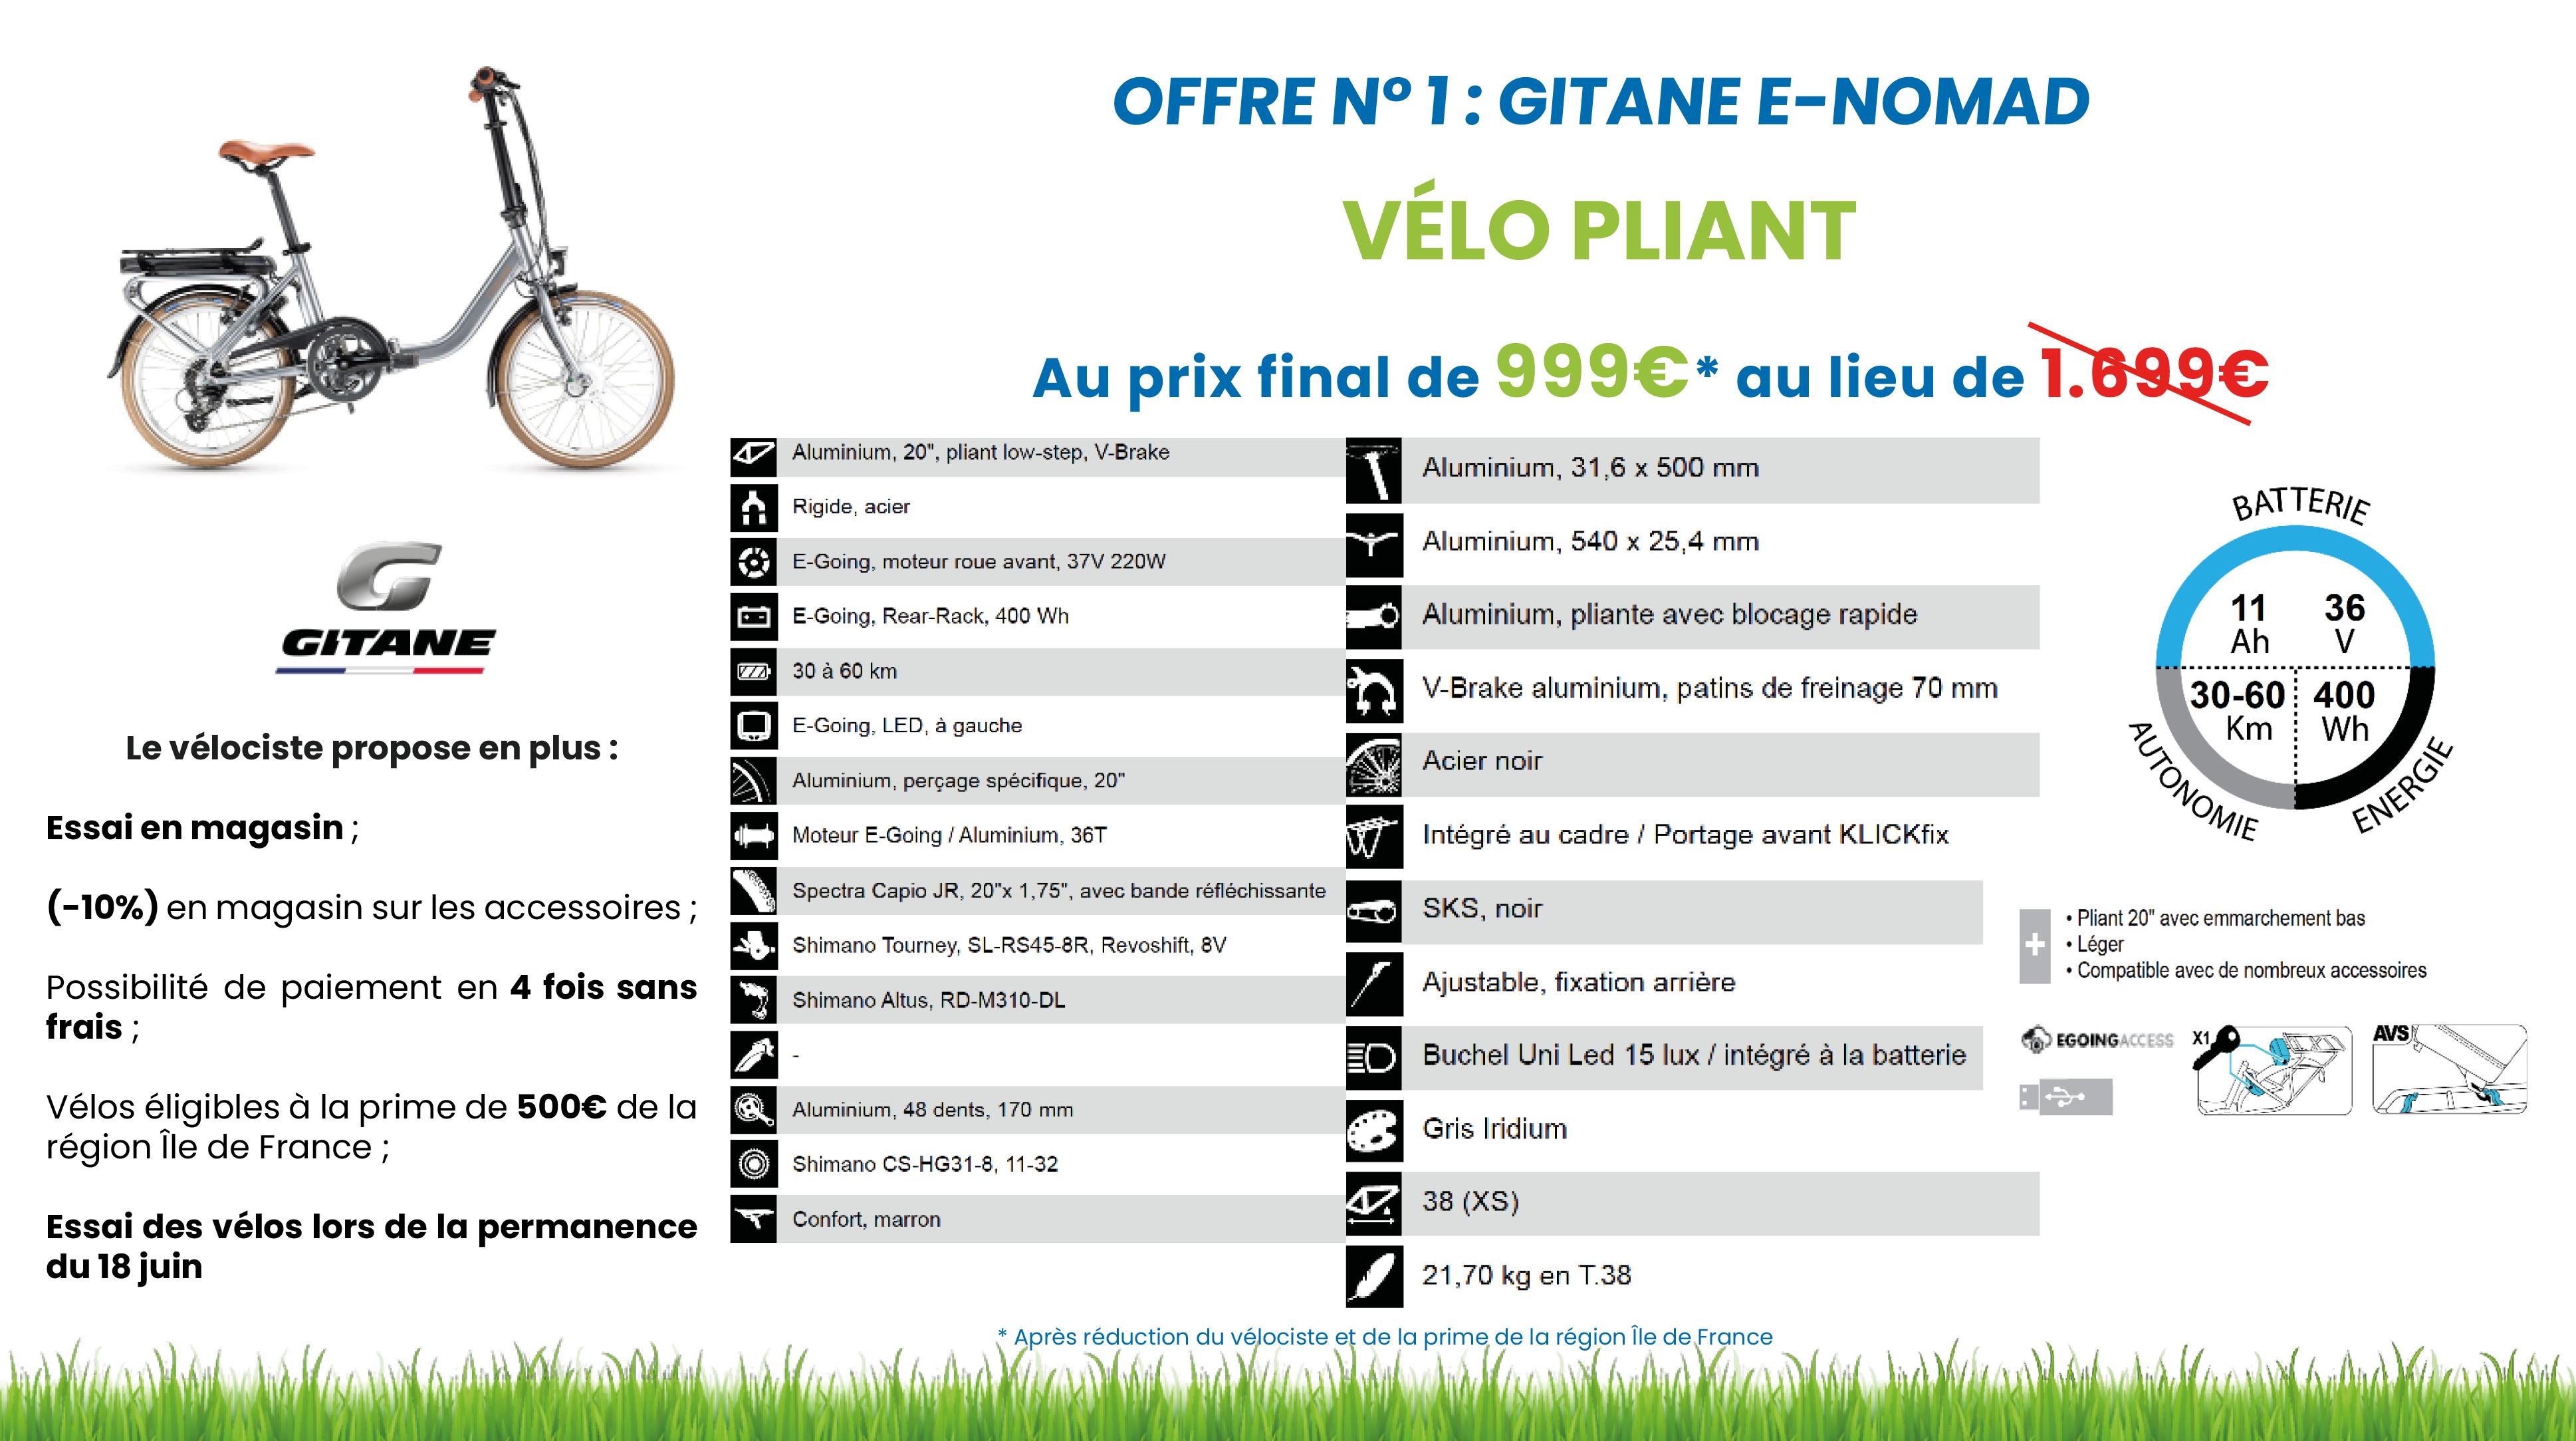 vélo nomad page